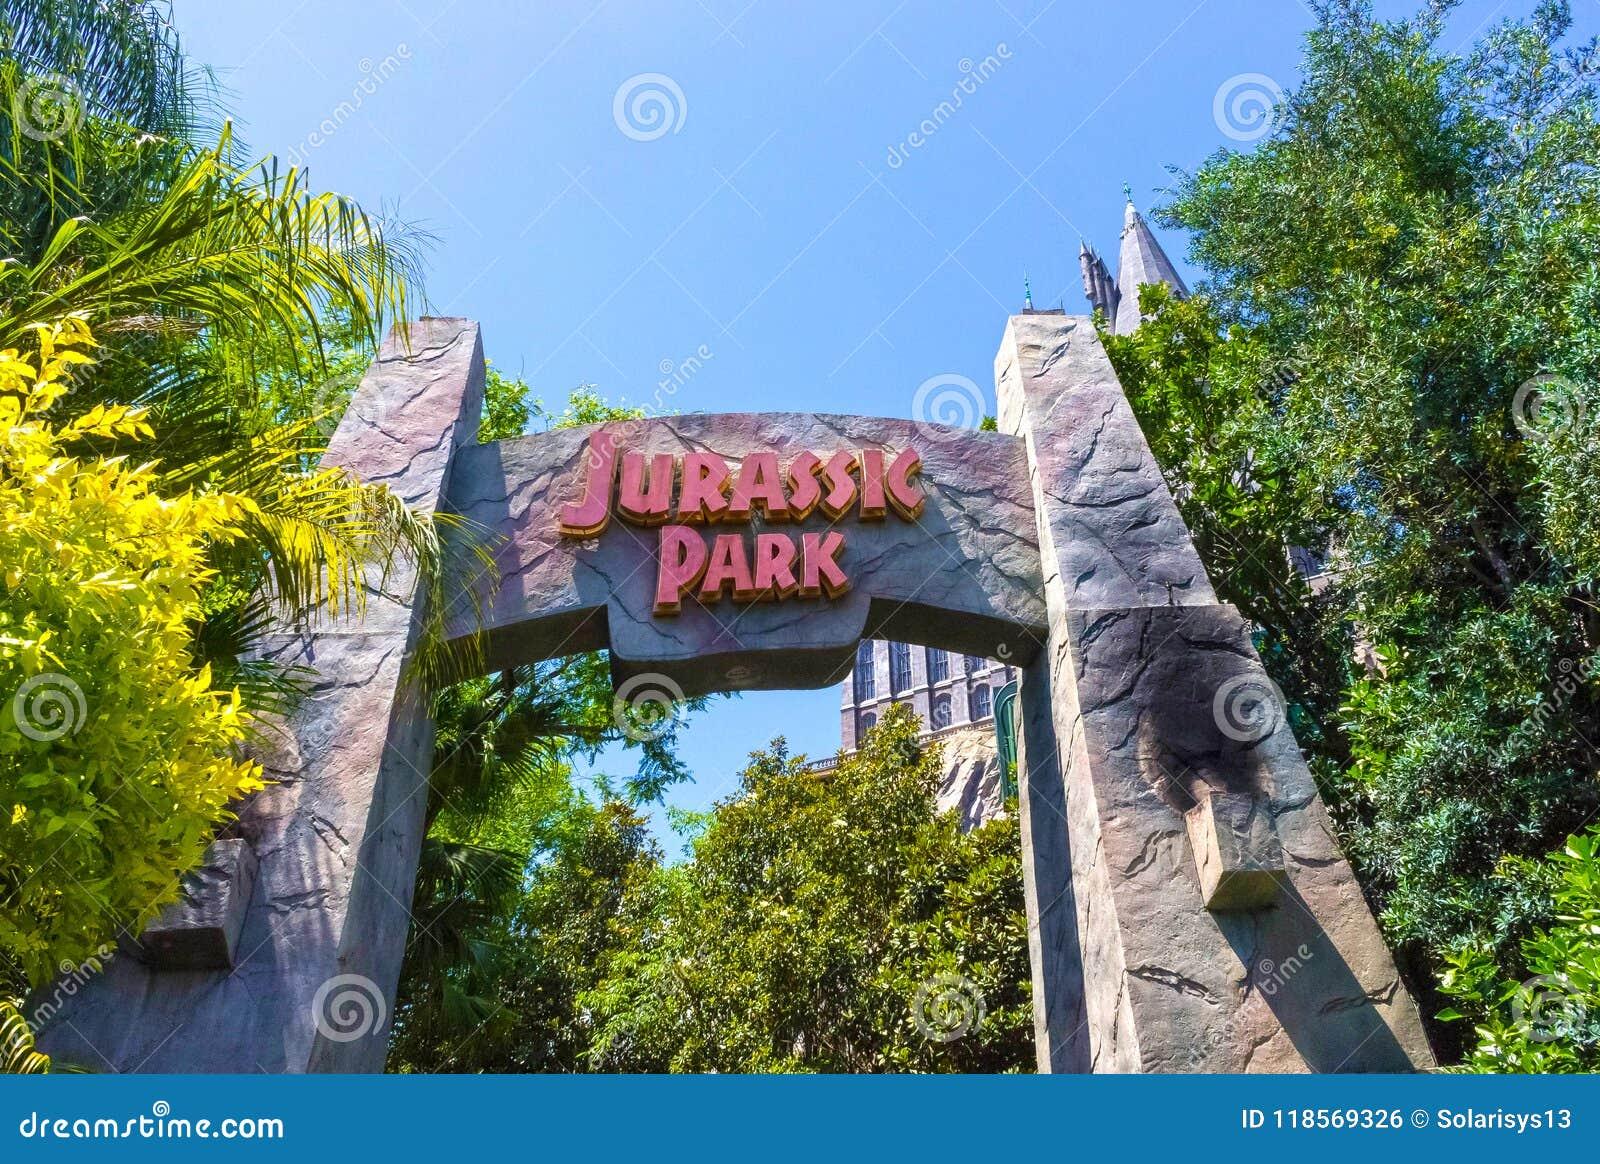 Map Of Universal Studios Florida.Orlando Florida May 09 2018 Jurassic Park At Universal Studios